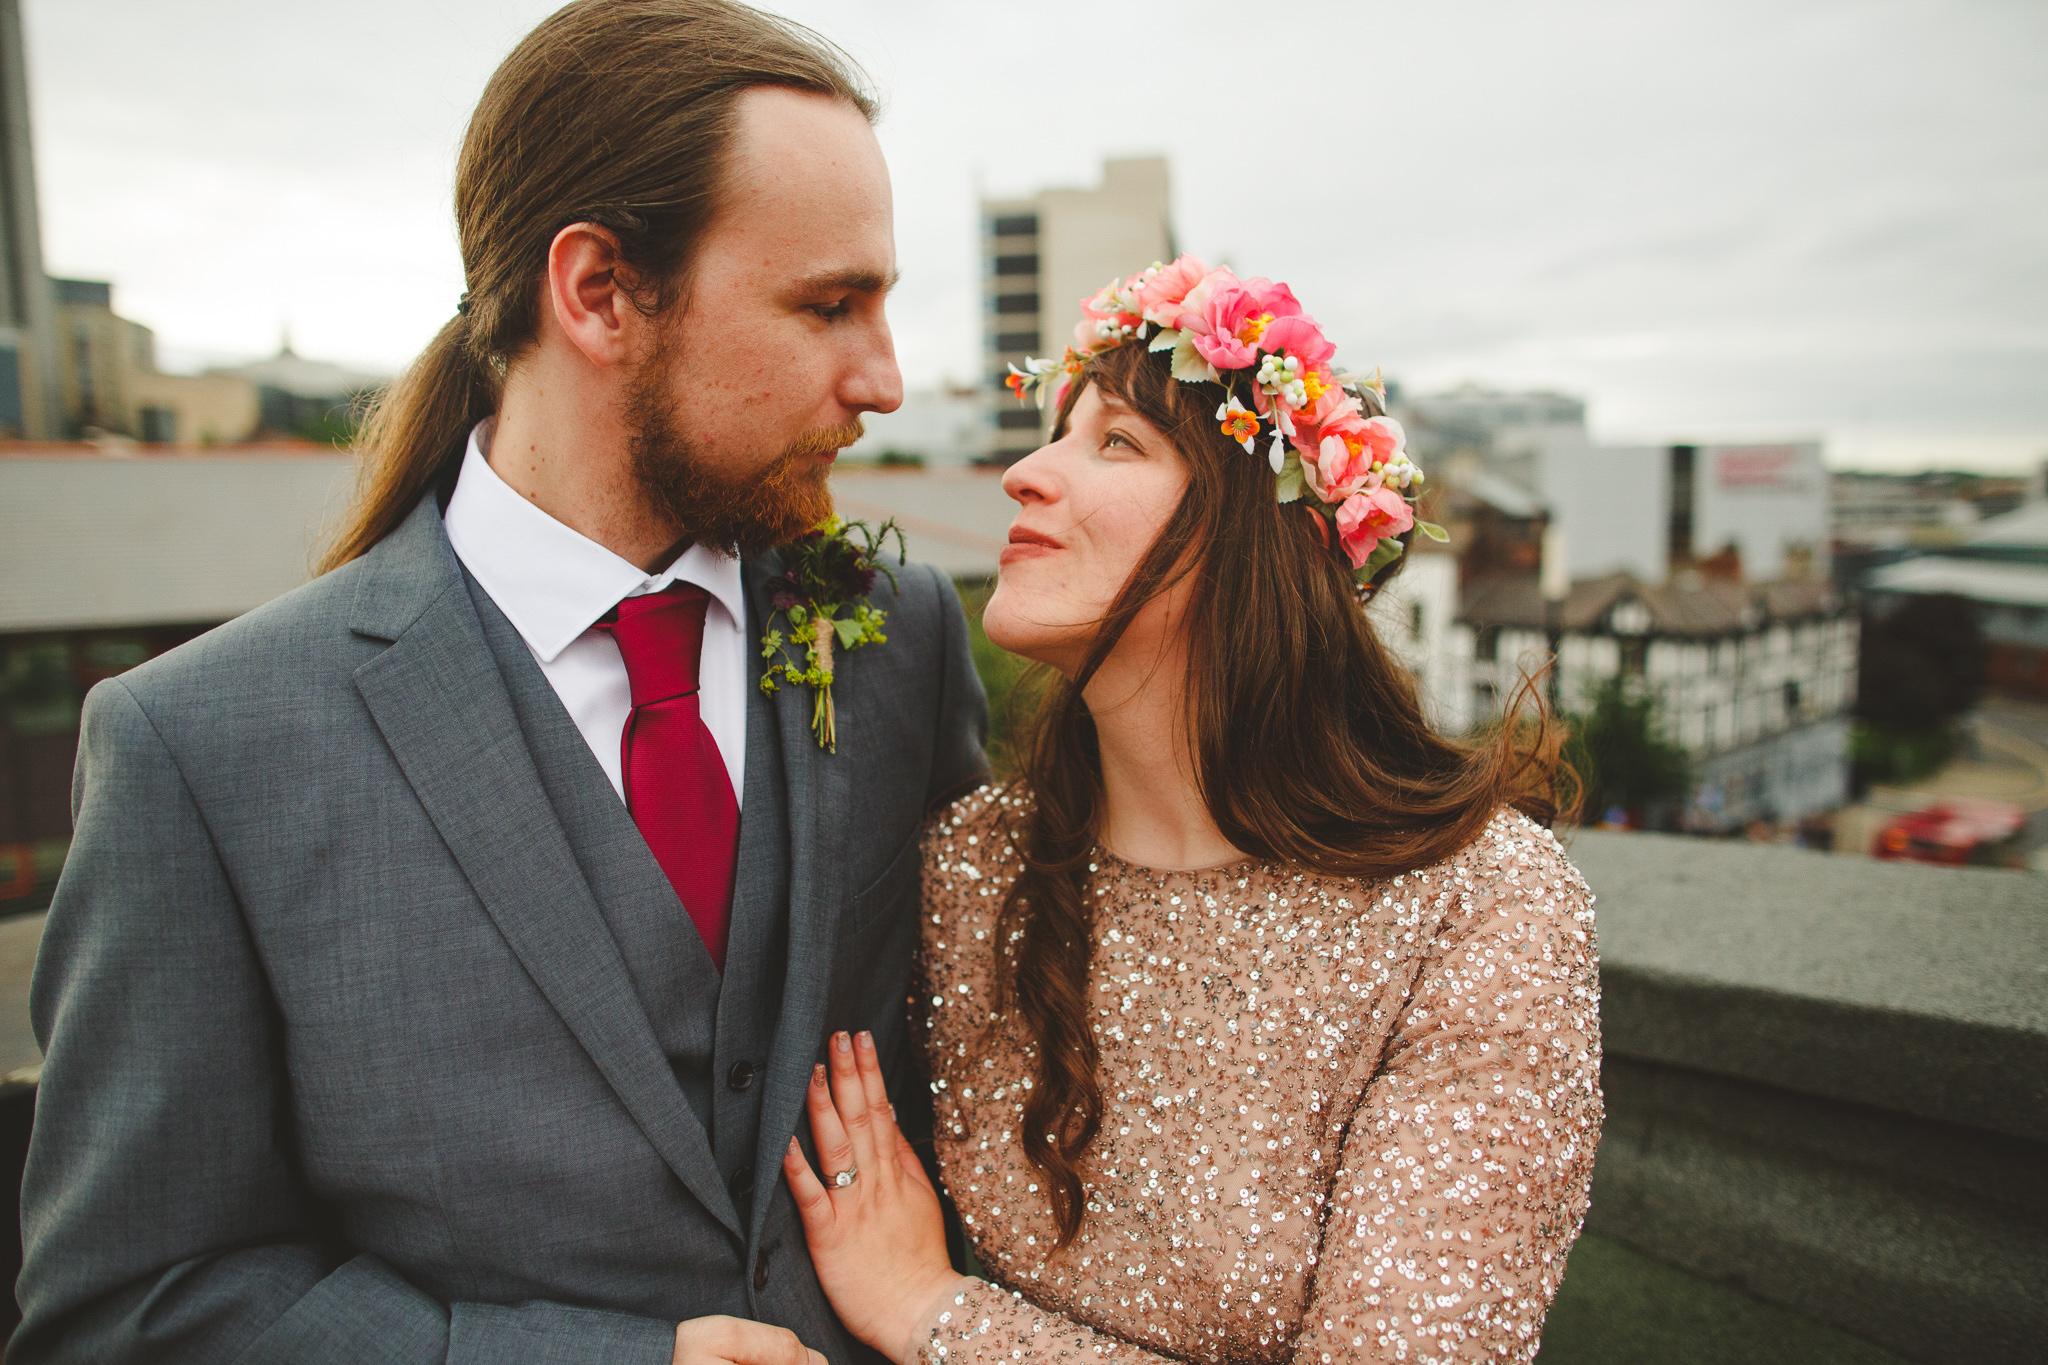 sheffield-wedding-photographer-roxysamblog-34.jpg